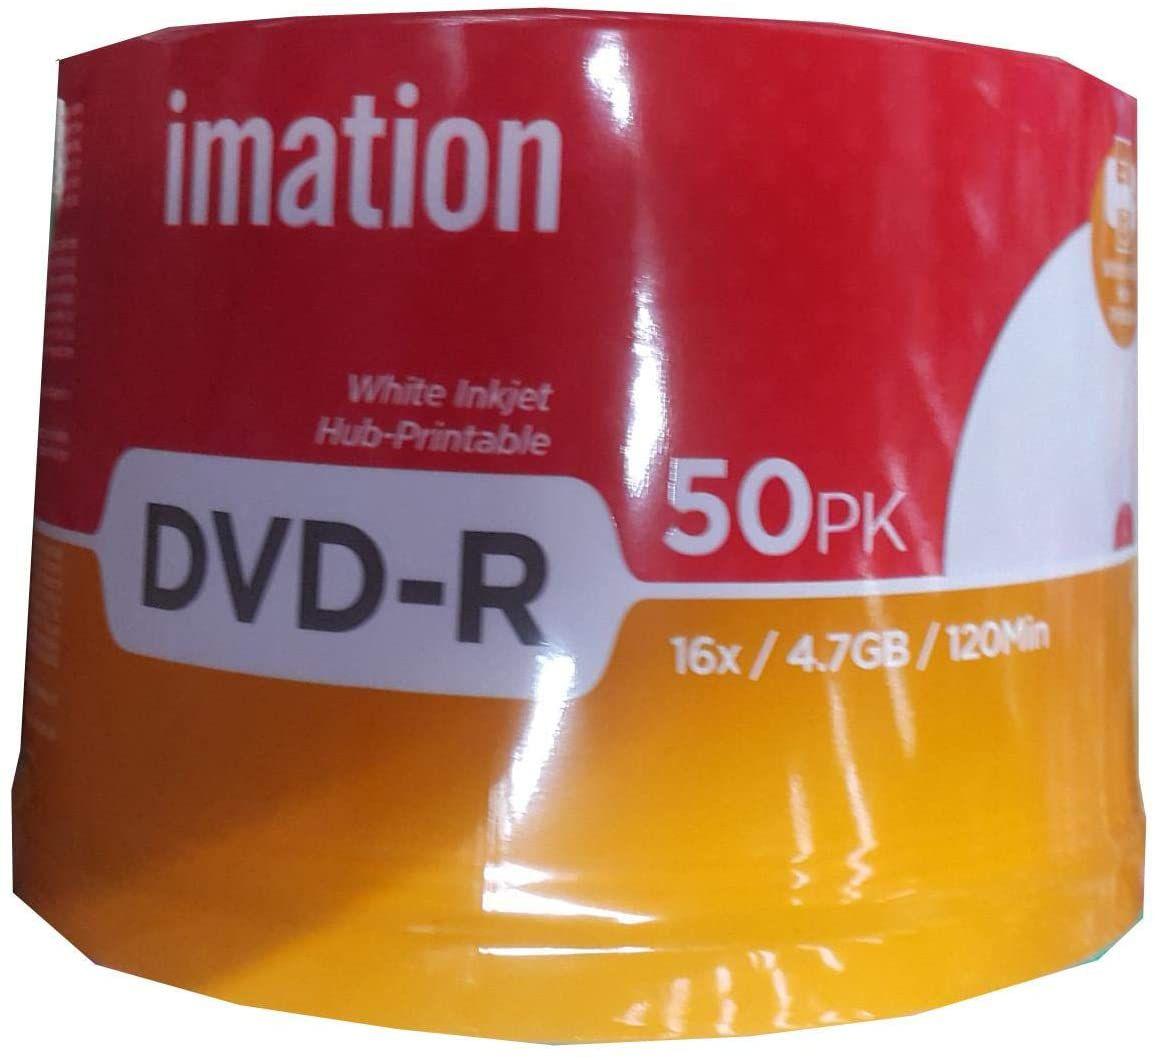 Imation DVD-R 4.7 GB 50 Pcs